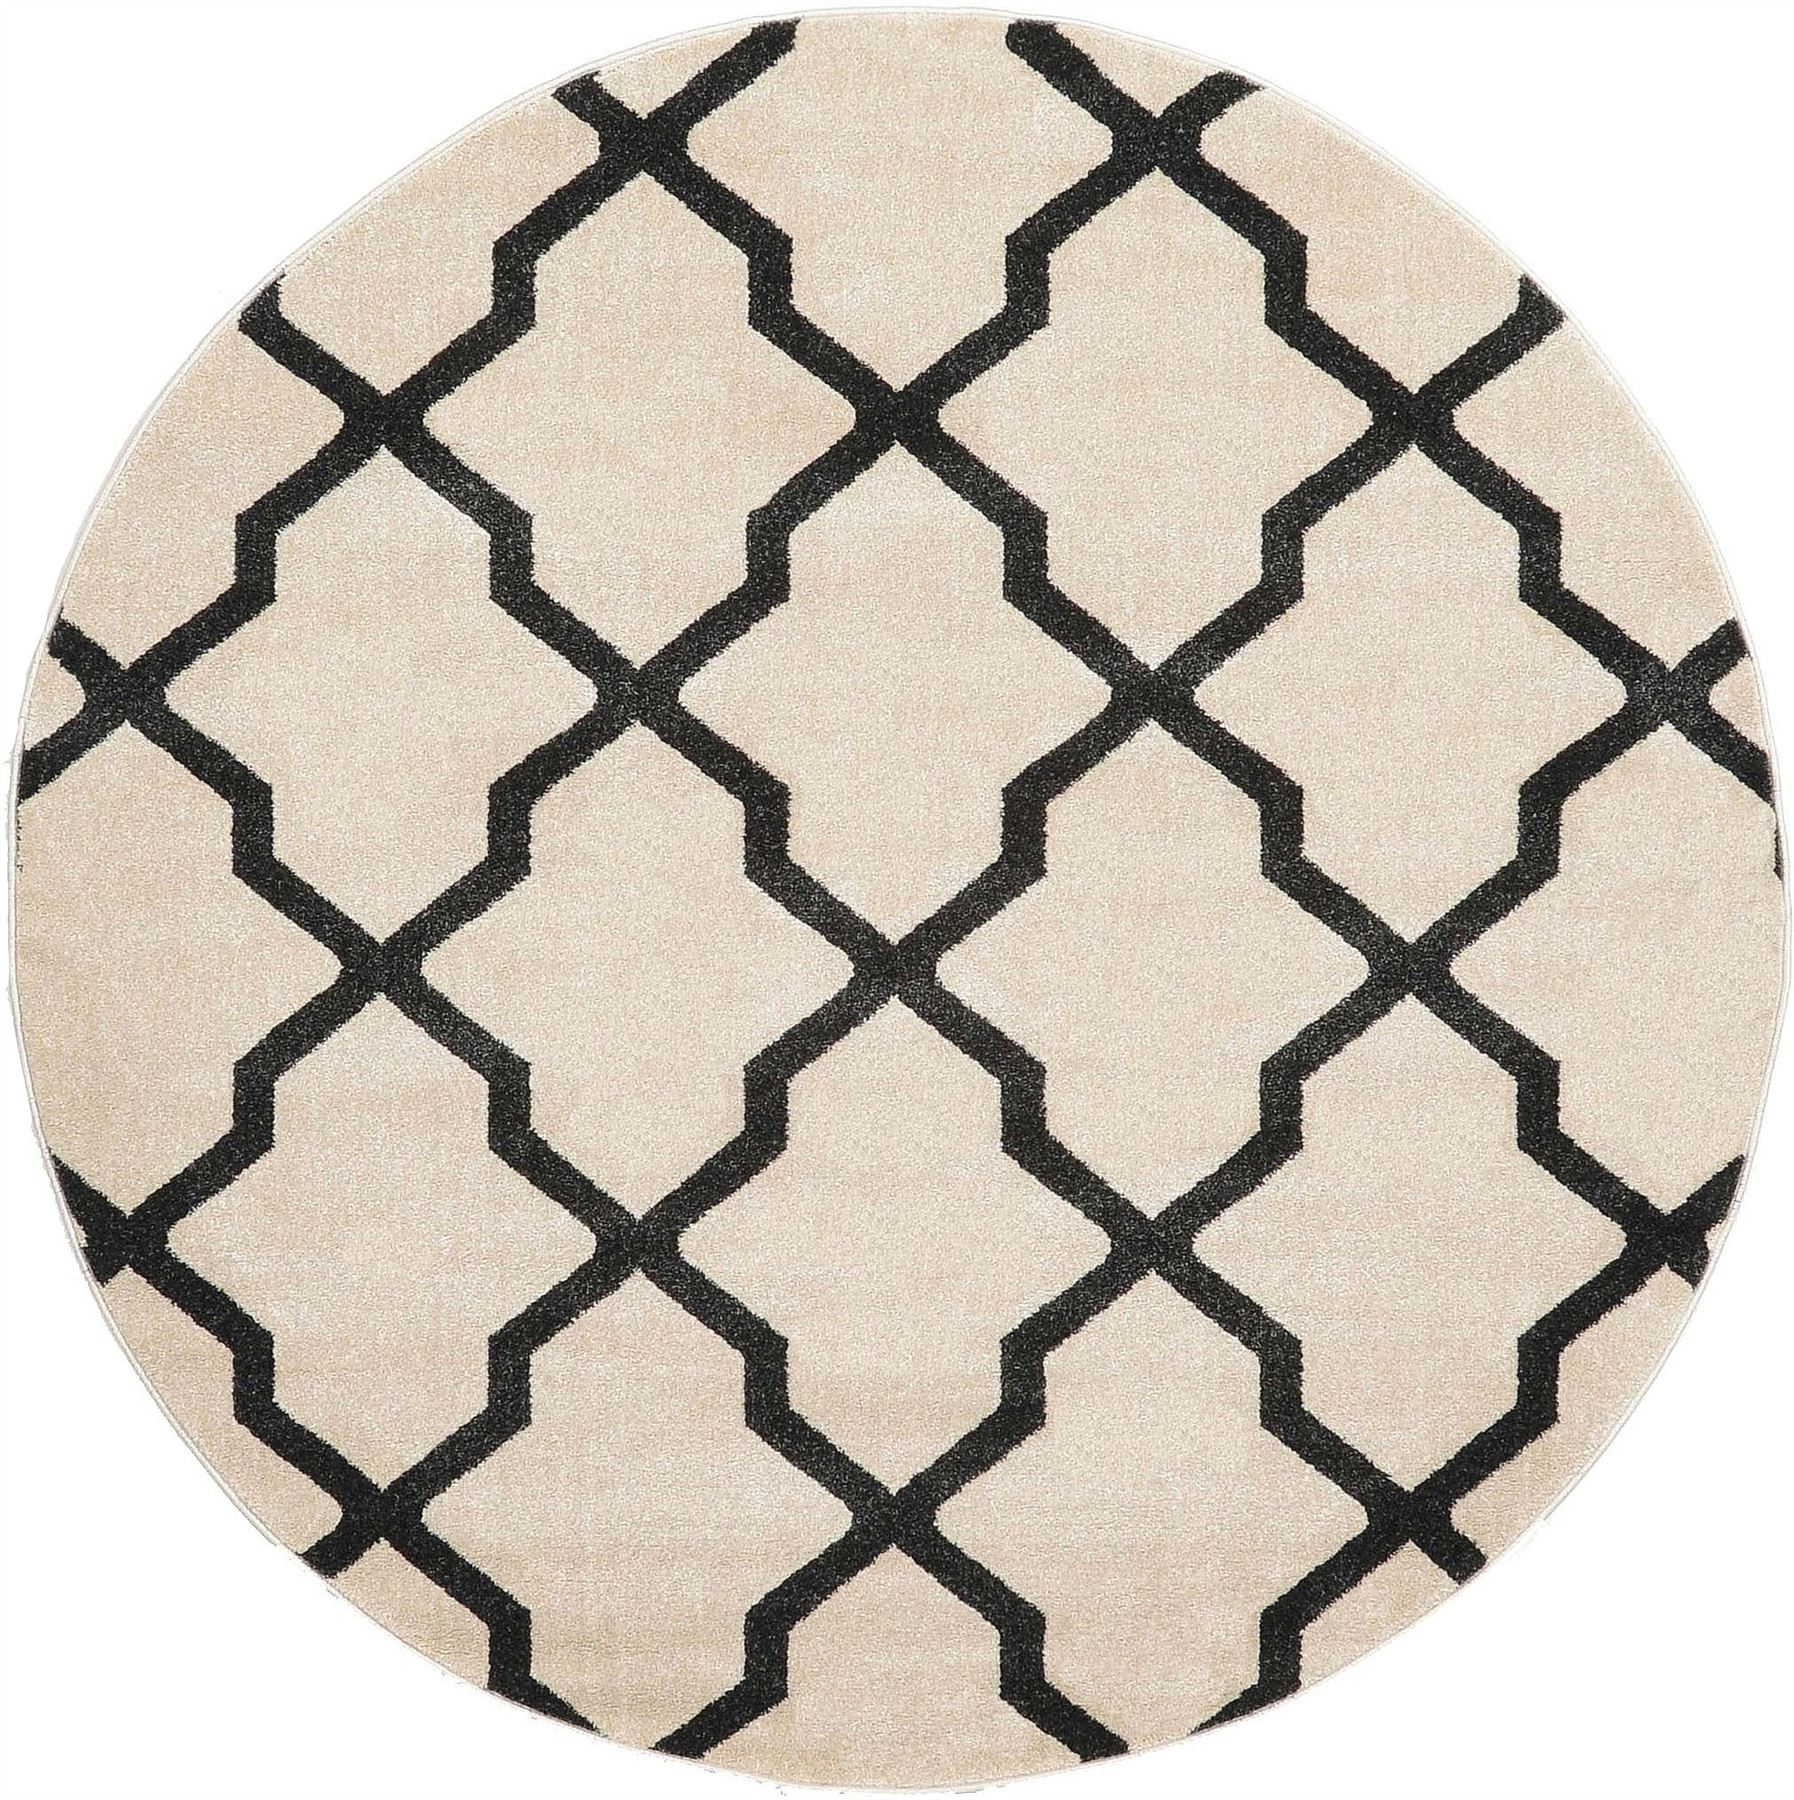 Trellis Moroccan Geometric Design Area Rug Modern